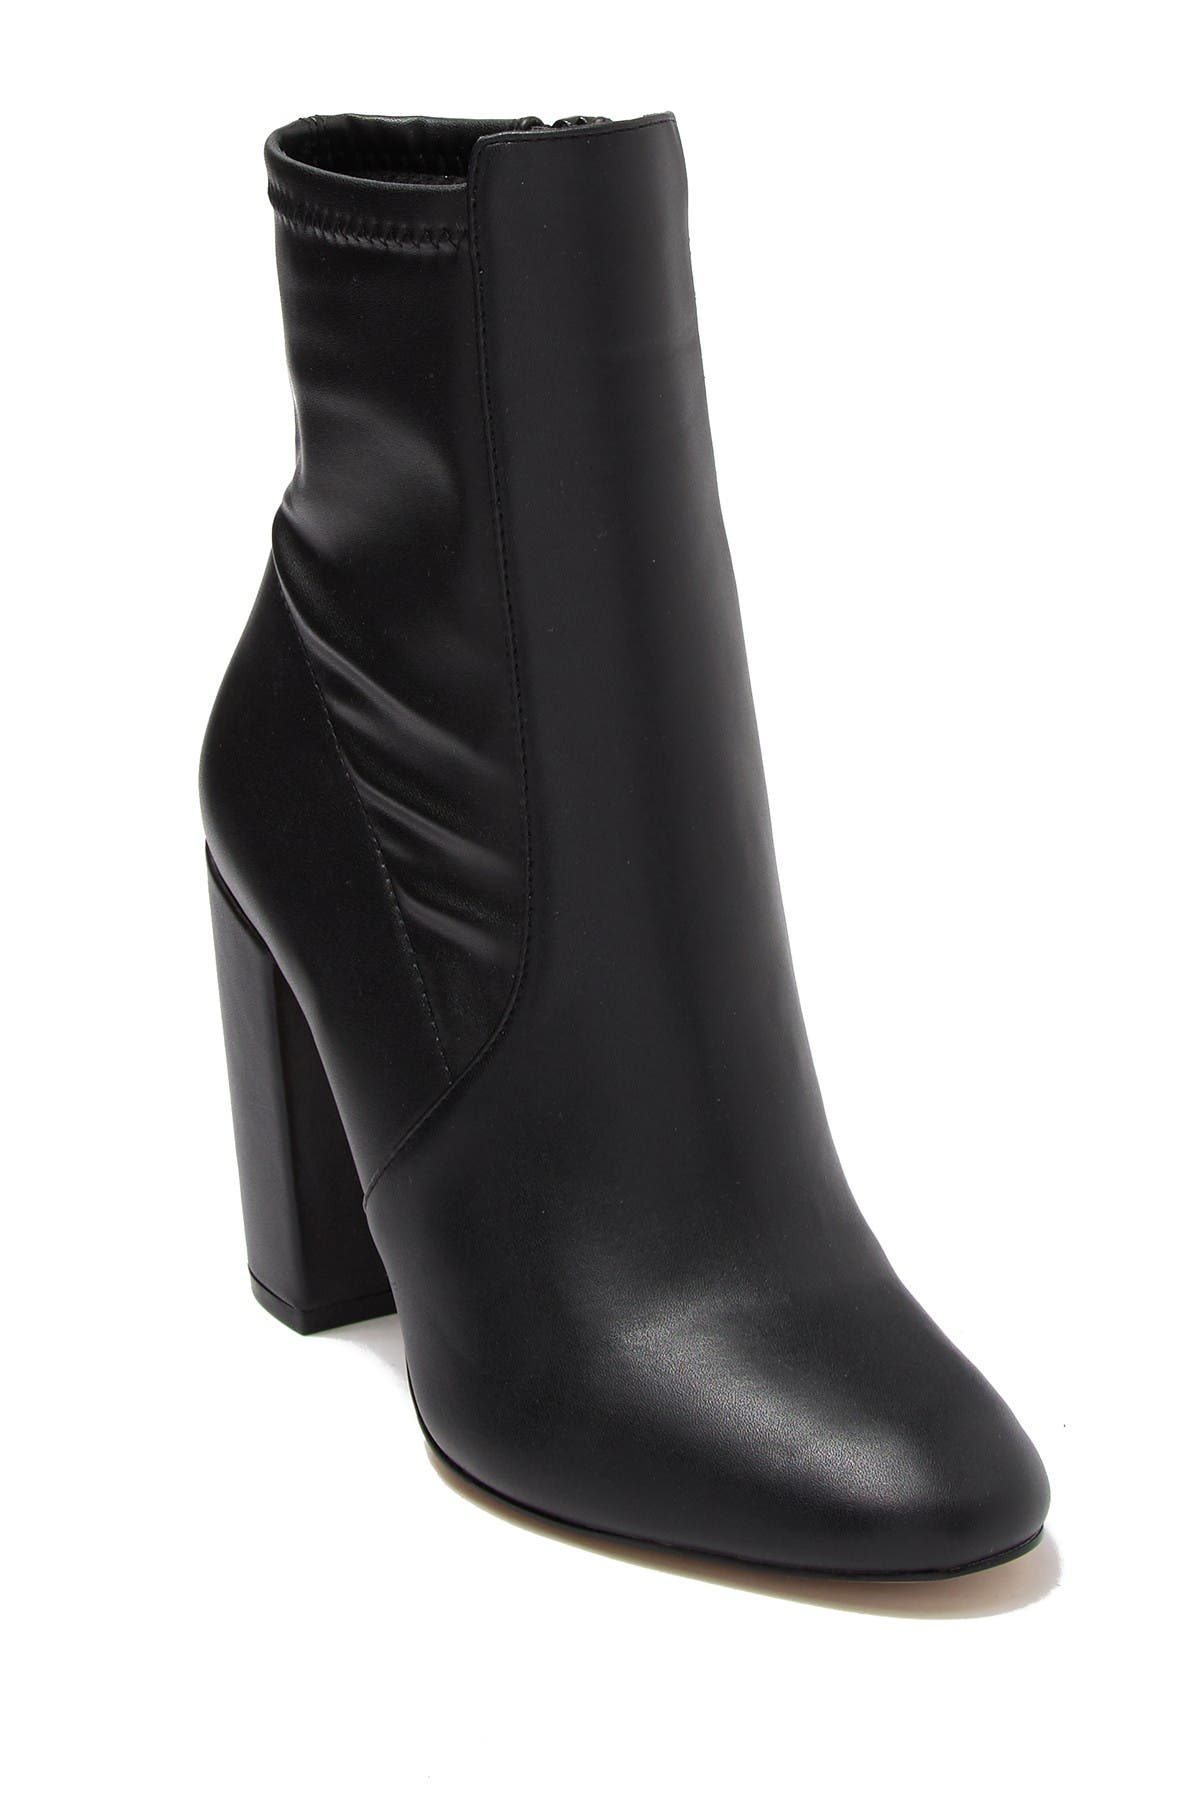 Aldo | Aurella Block Heel Ankle Boot